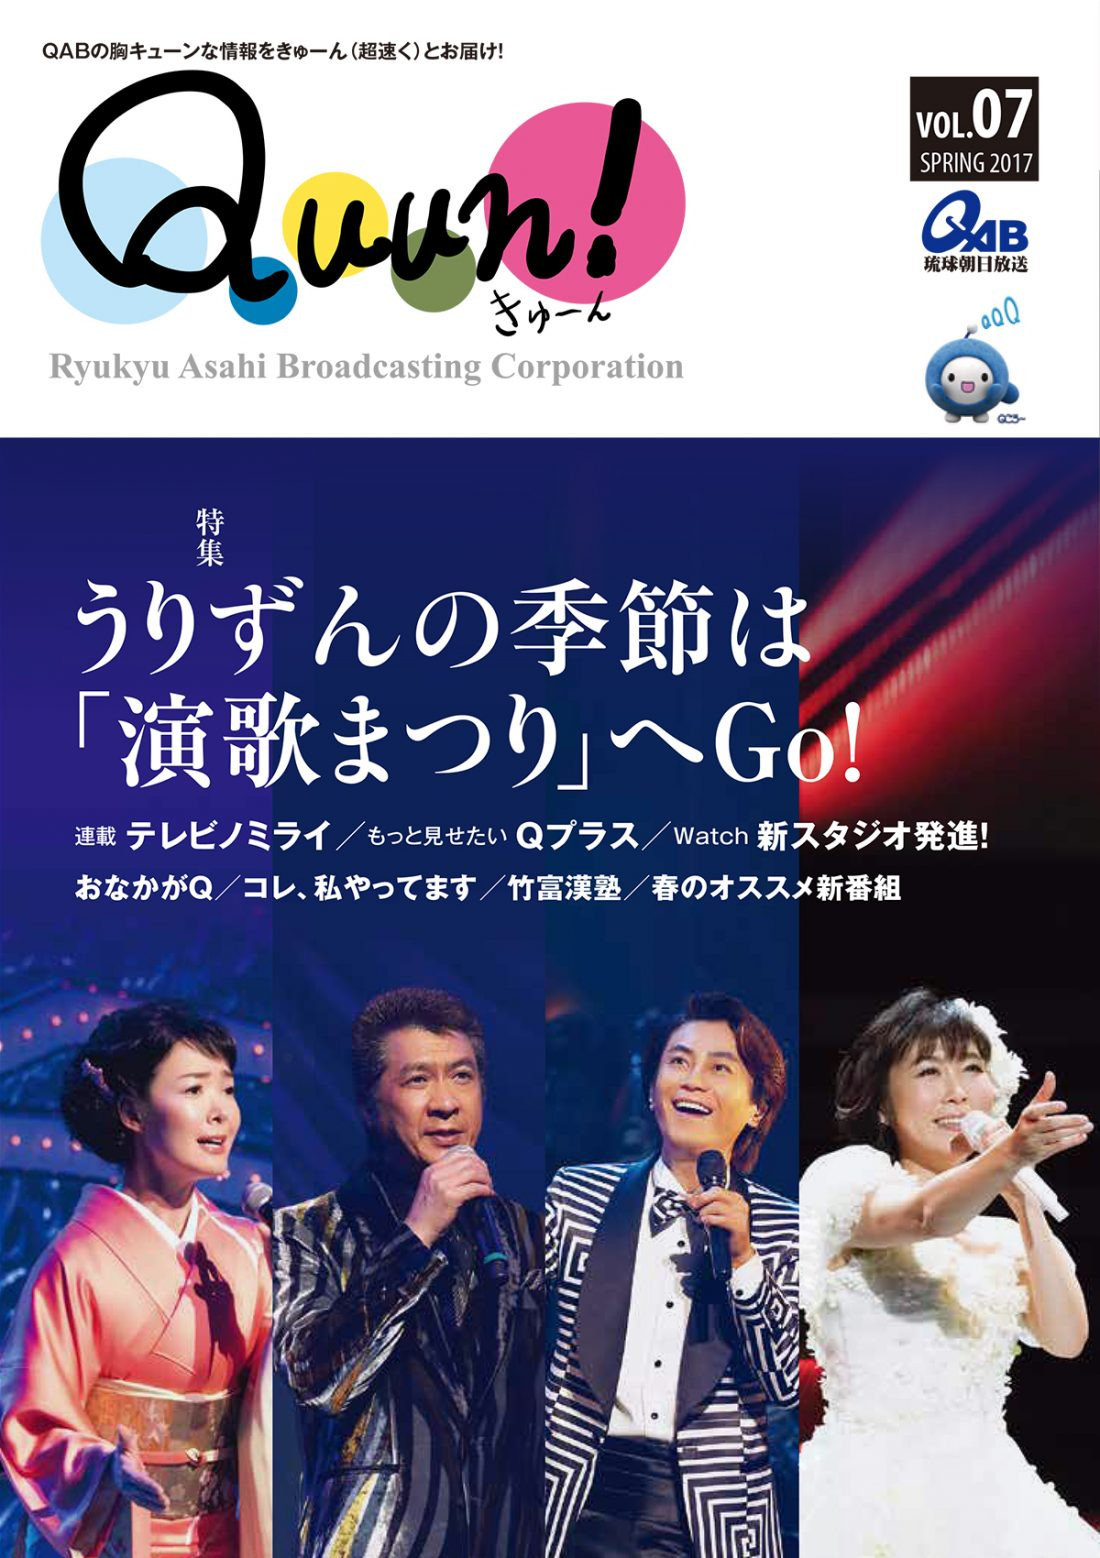 https://www.qab.co.jp/qgoro/wp-content/uploads/quun_0701-1100x1558.jpg